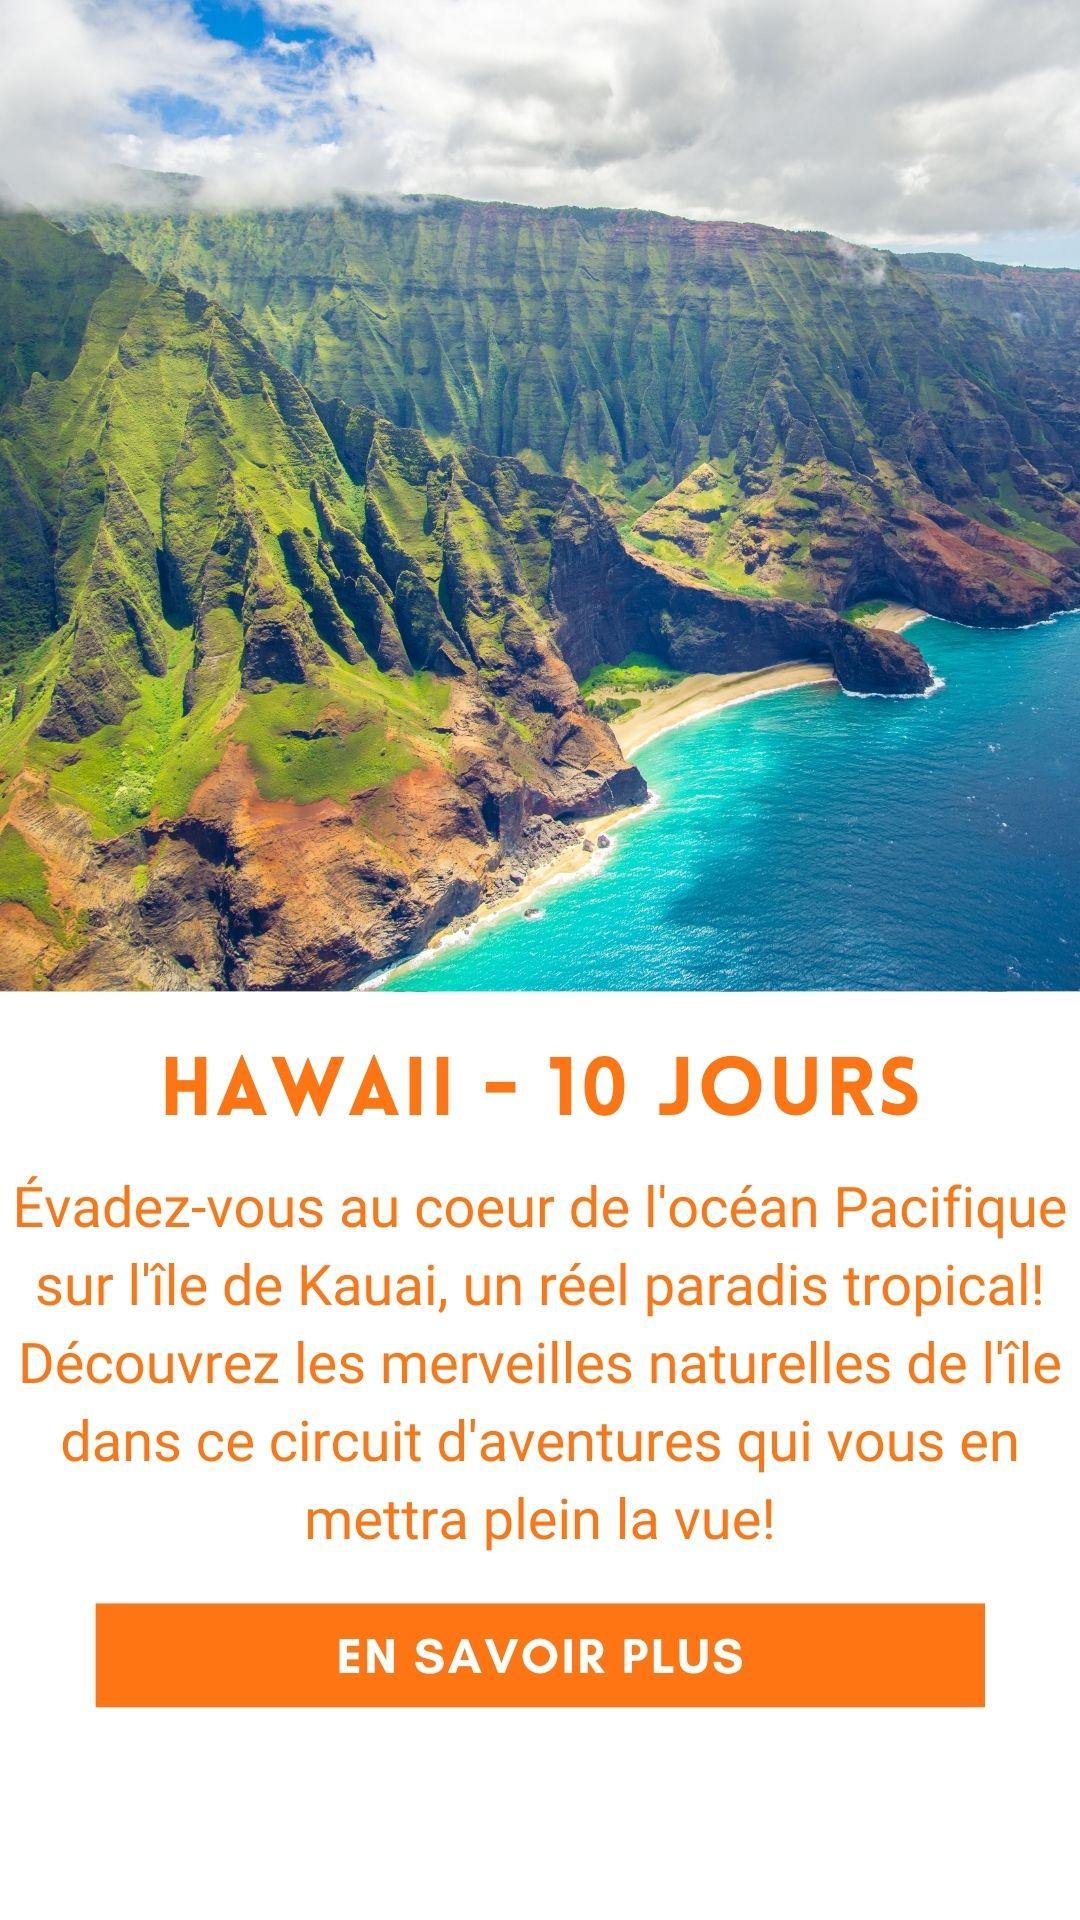 Voyage organisé à Hawaii